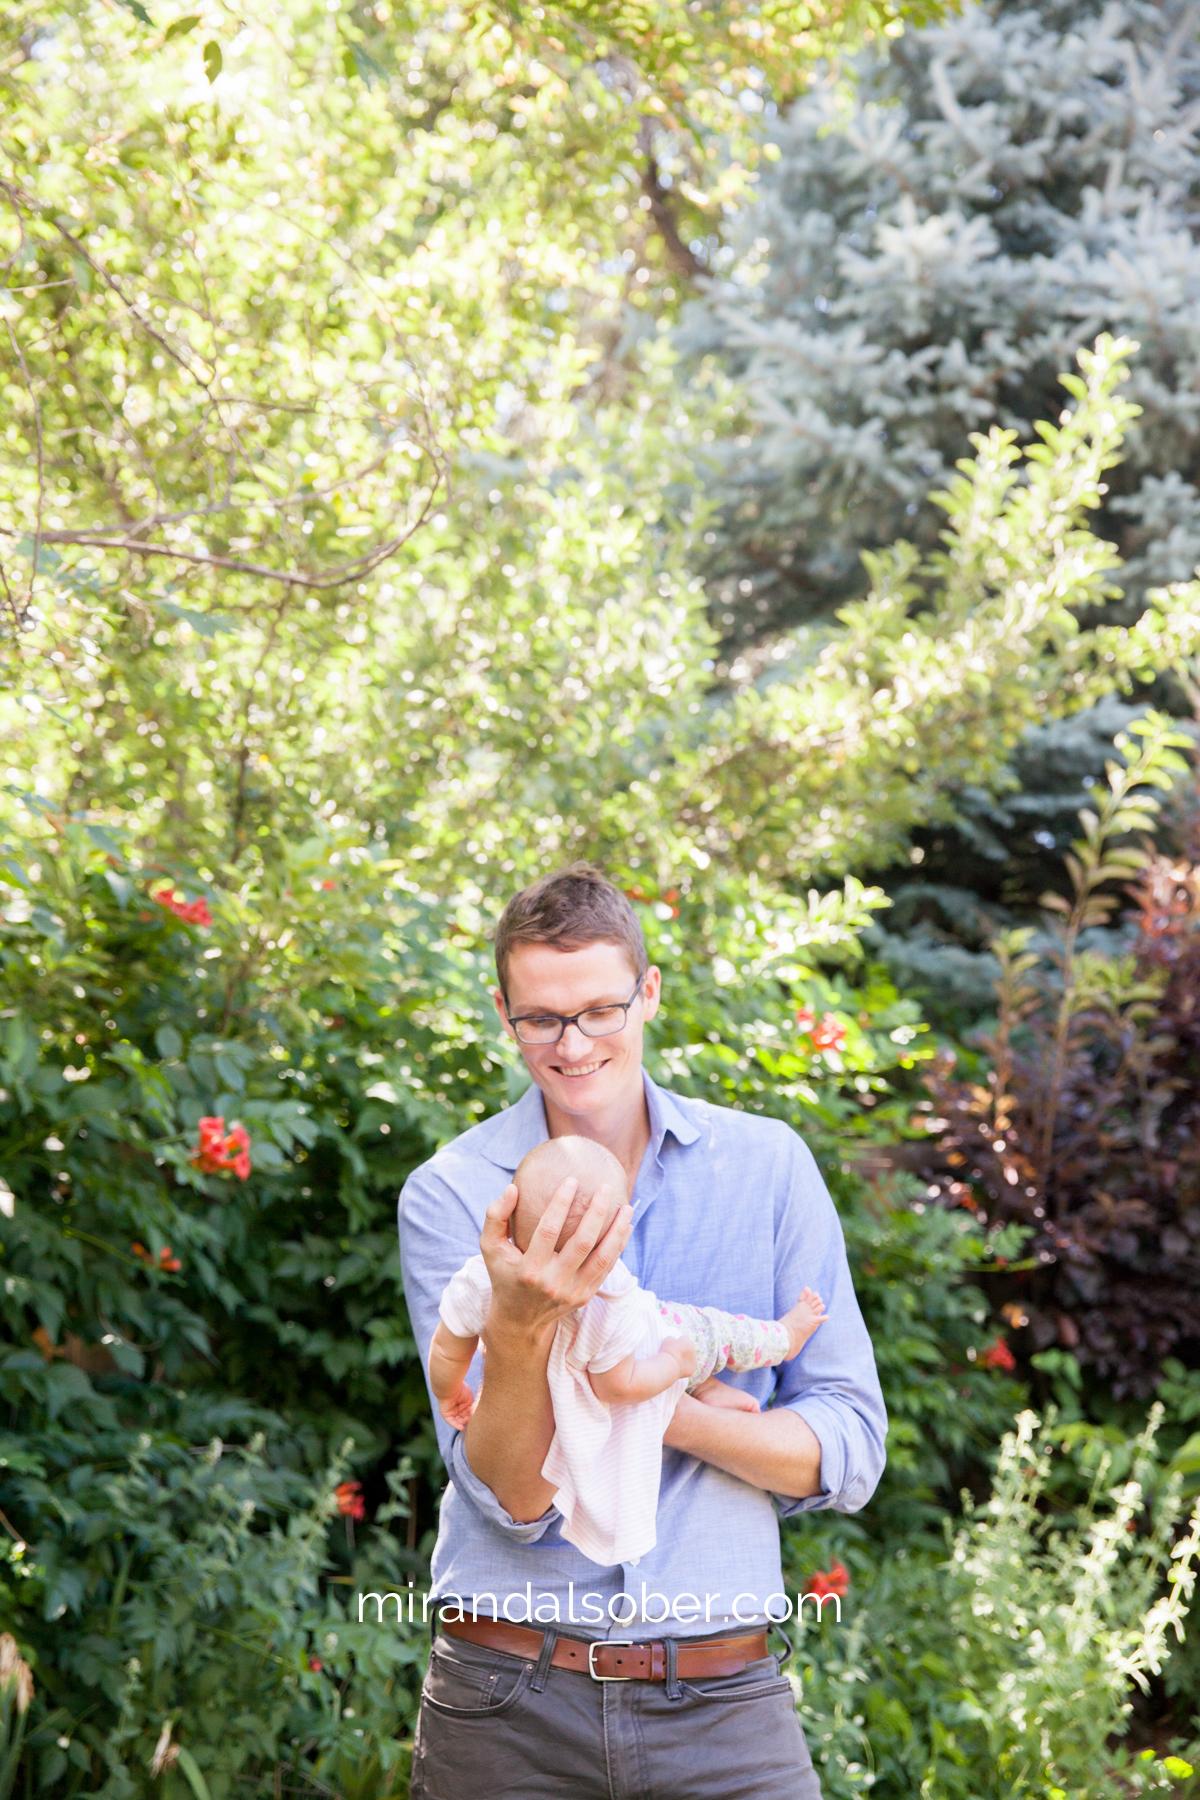 Boulder baby photographers, Miranda L. Sober Photography, baby photographers in Boulder